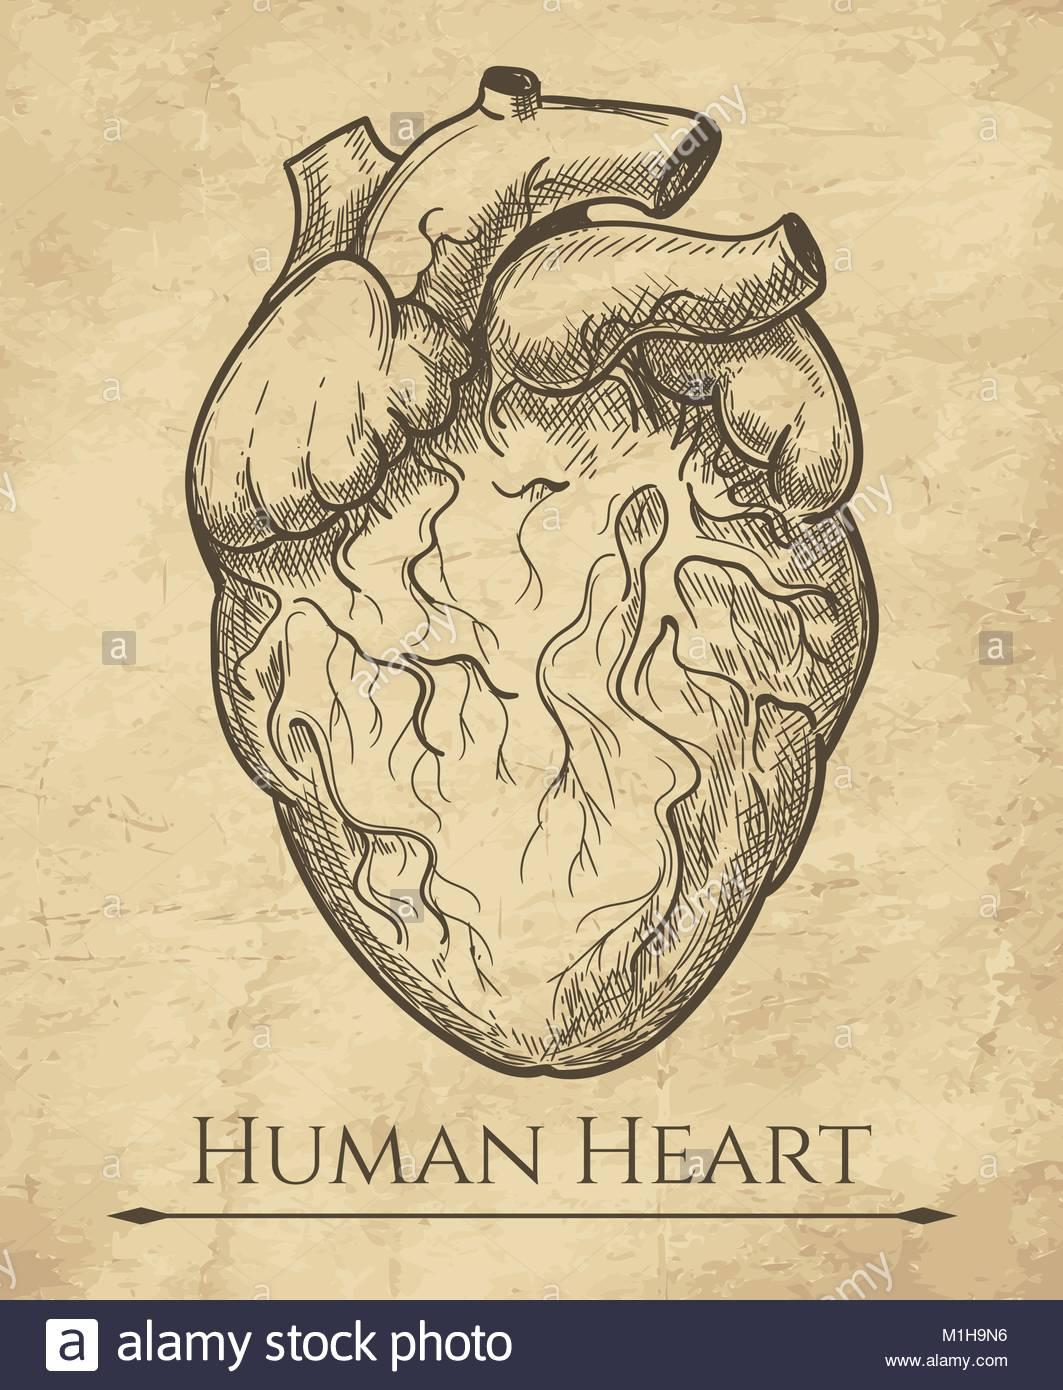 1063x1390 Human Heart Sketch. Anatomical Heart Organ Etching Drawing